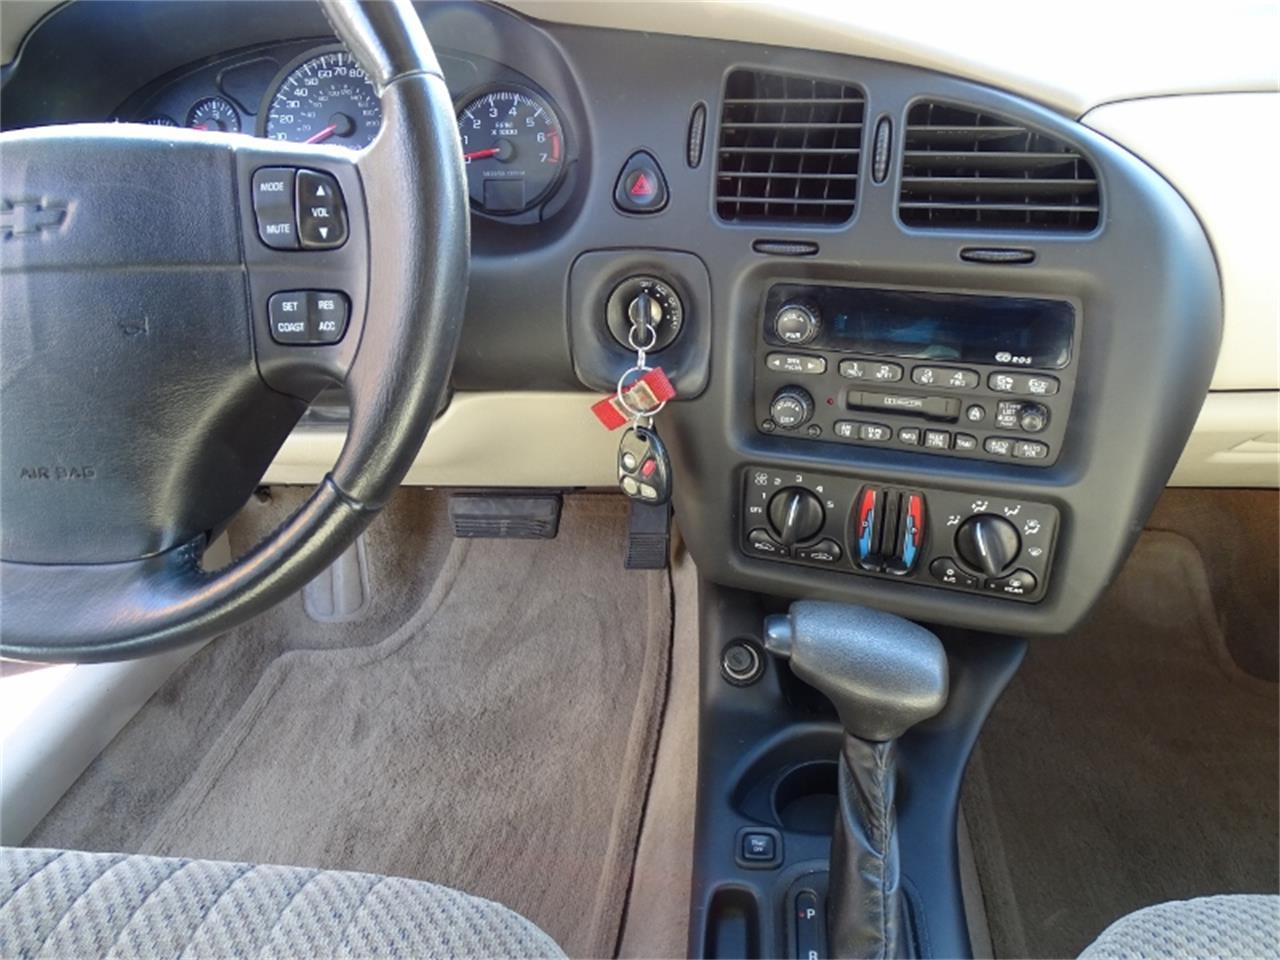 2001 Chevrolet Monte Carlo (CC-1035043) for sale in Hibbing, Minnesota